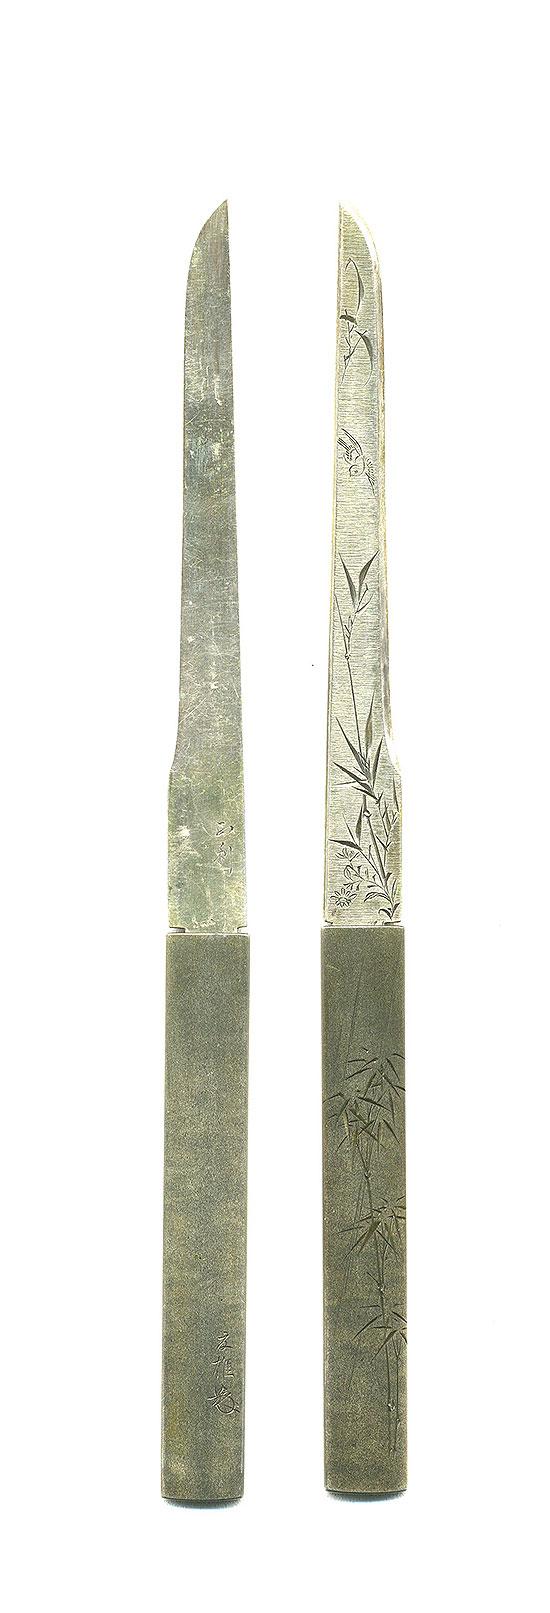 B105 夏雄大鑑 所載品 小柄 雨竹図 加納夏雄 Kozuka Natsuo design of Bamboo in the Rain